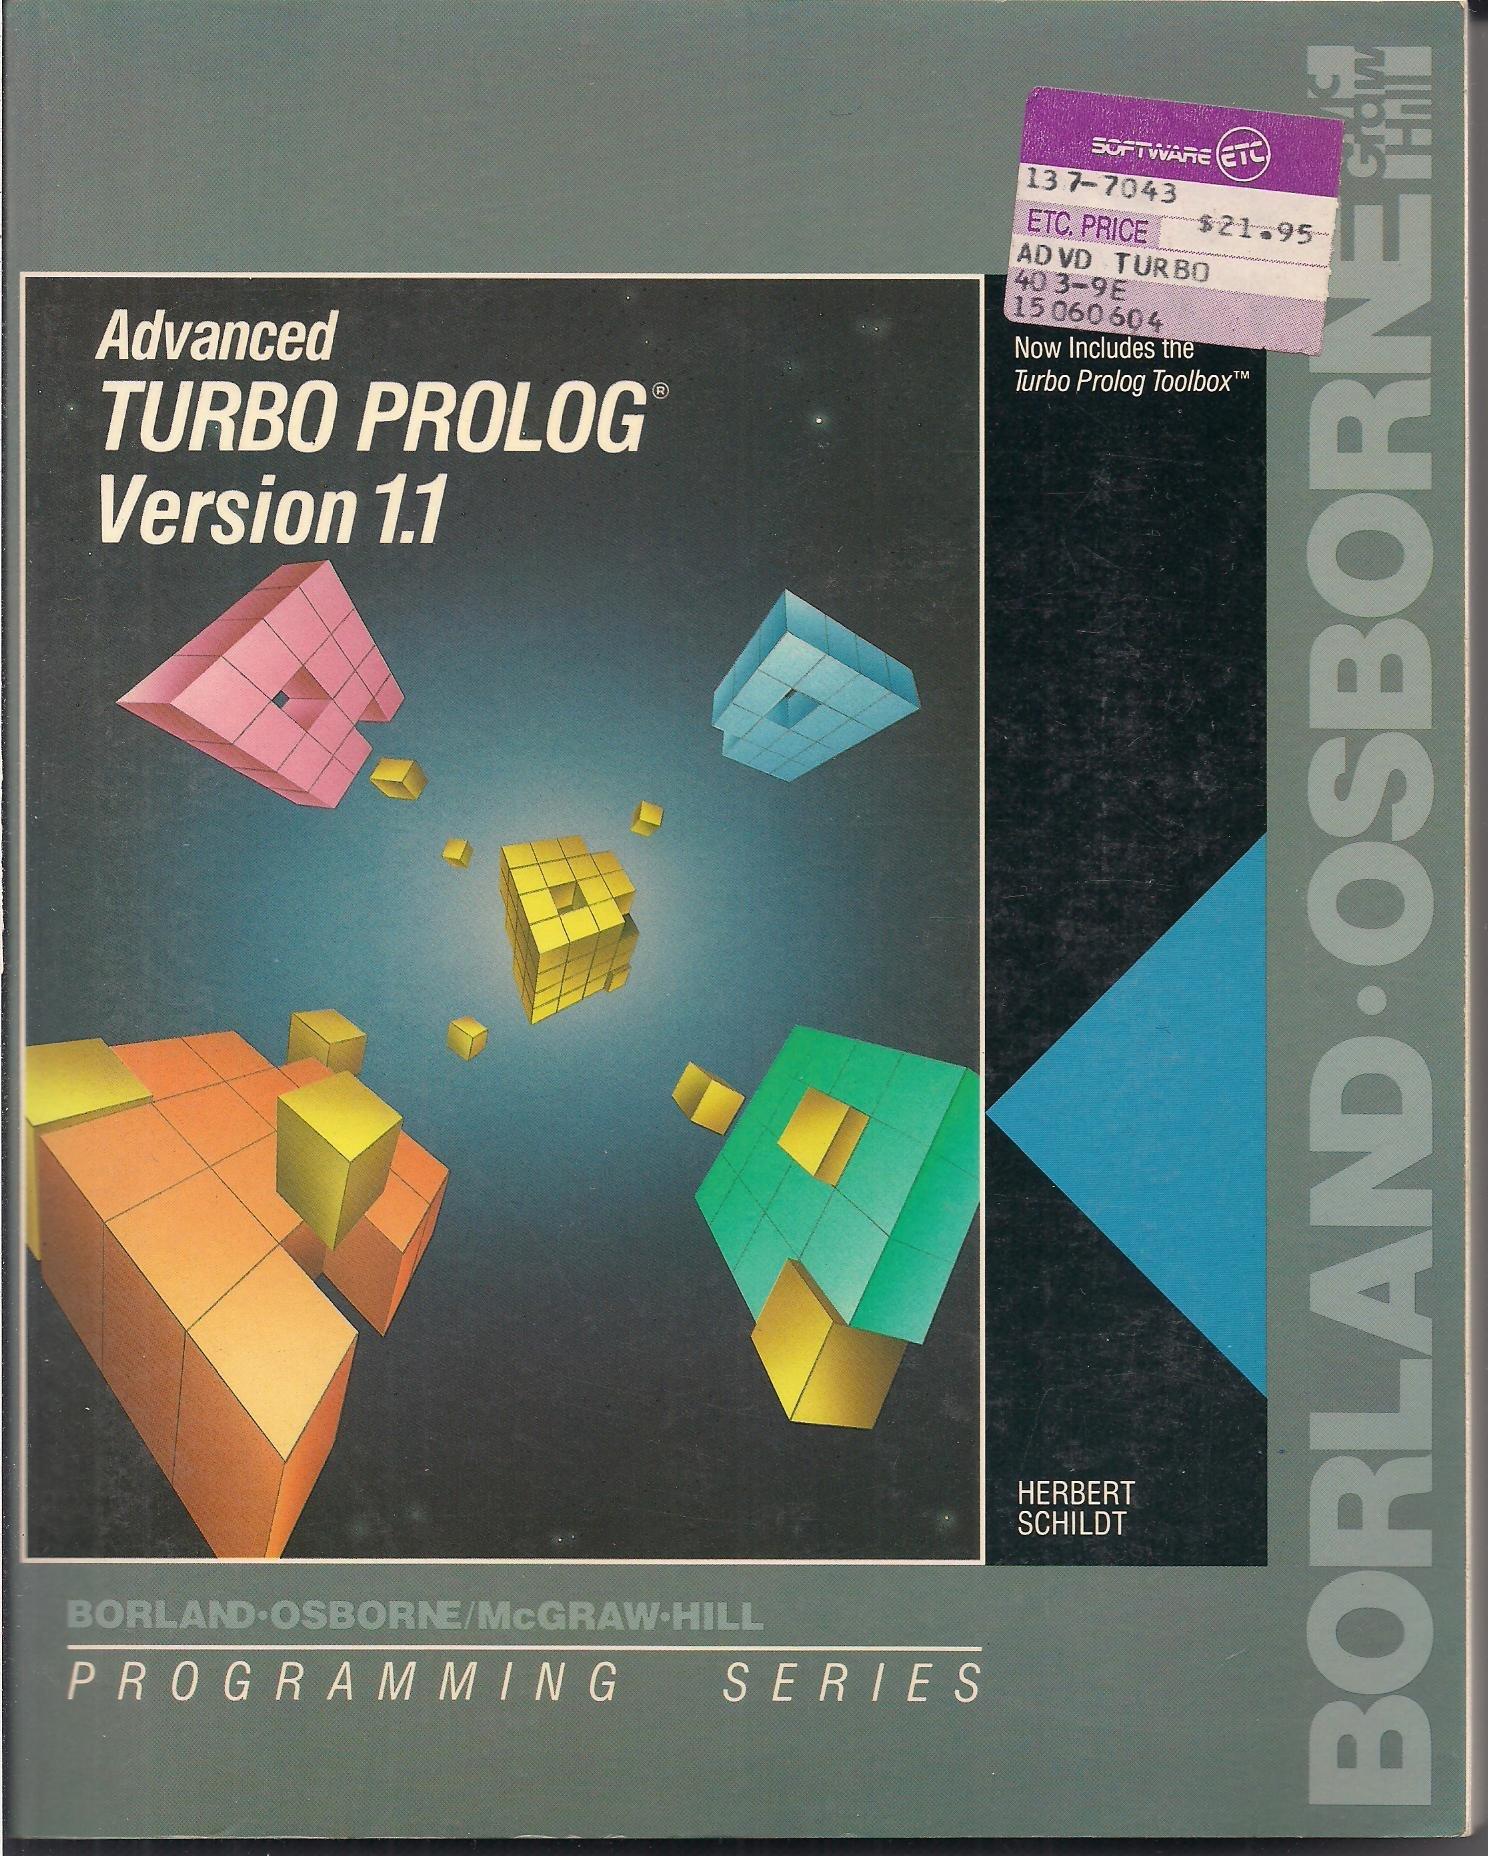 Advanced Turbo PROLOG: Version 1. 1 Programming series: Amazon.es: Herbert Schildt: Libros en idiomas extranjeros